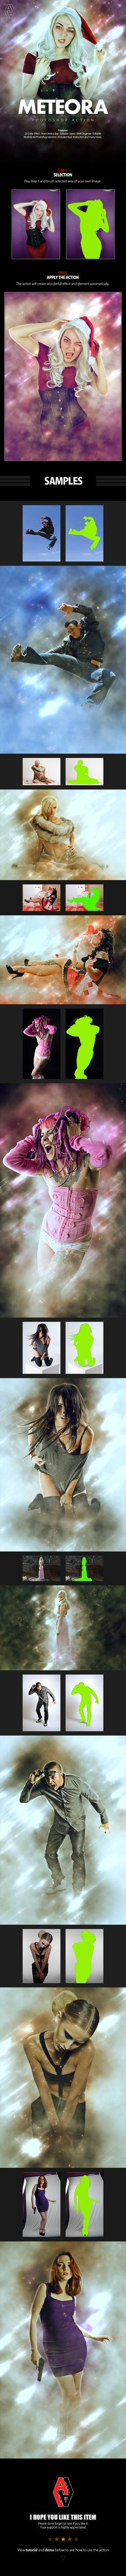 Meteora Photoshop Action — Photoshop ABR #smoke #best action • Download ➝ https://graphicriver.net/item/meteora-photoshop-action/18917148?ref=pxcr